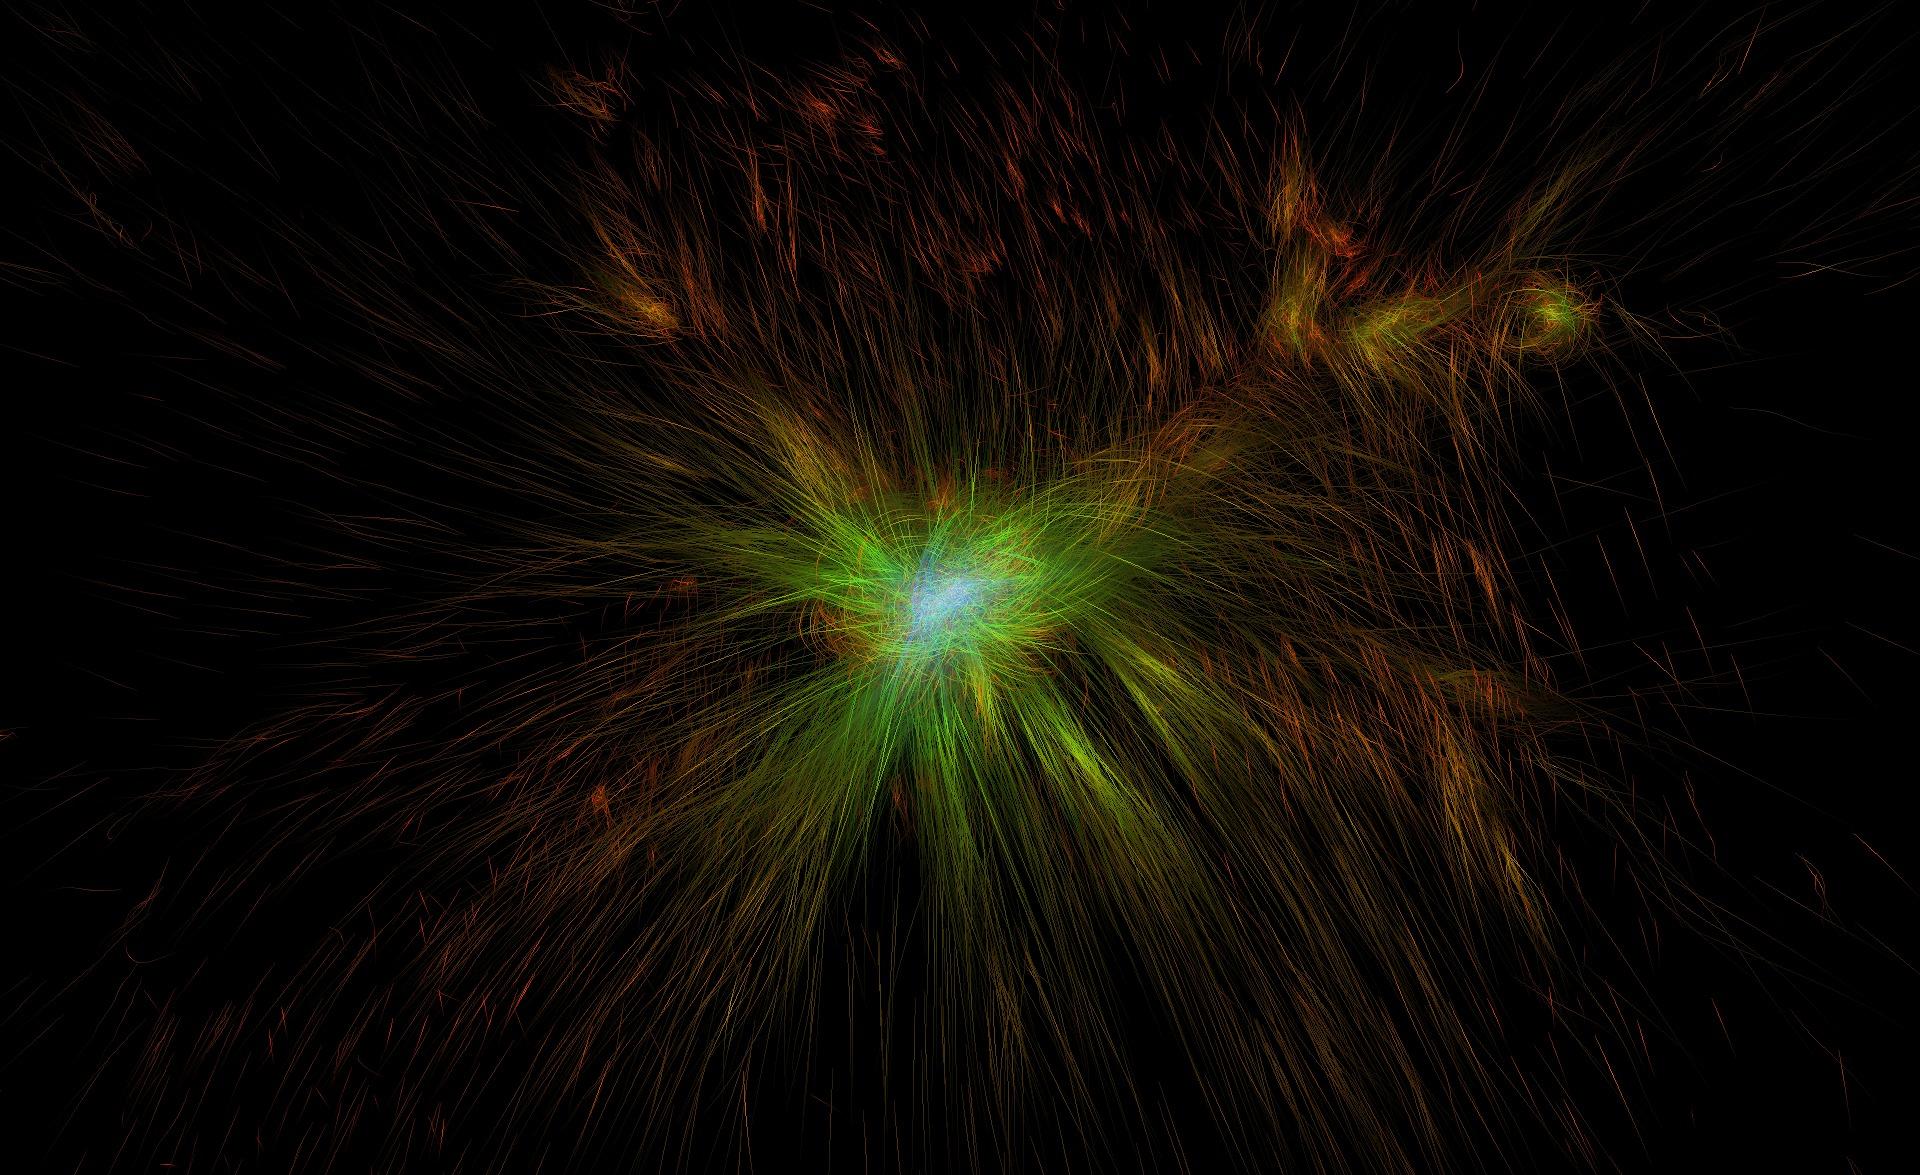 dark matter wallpaper hd images pictures becuo